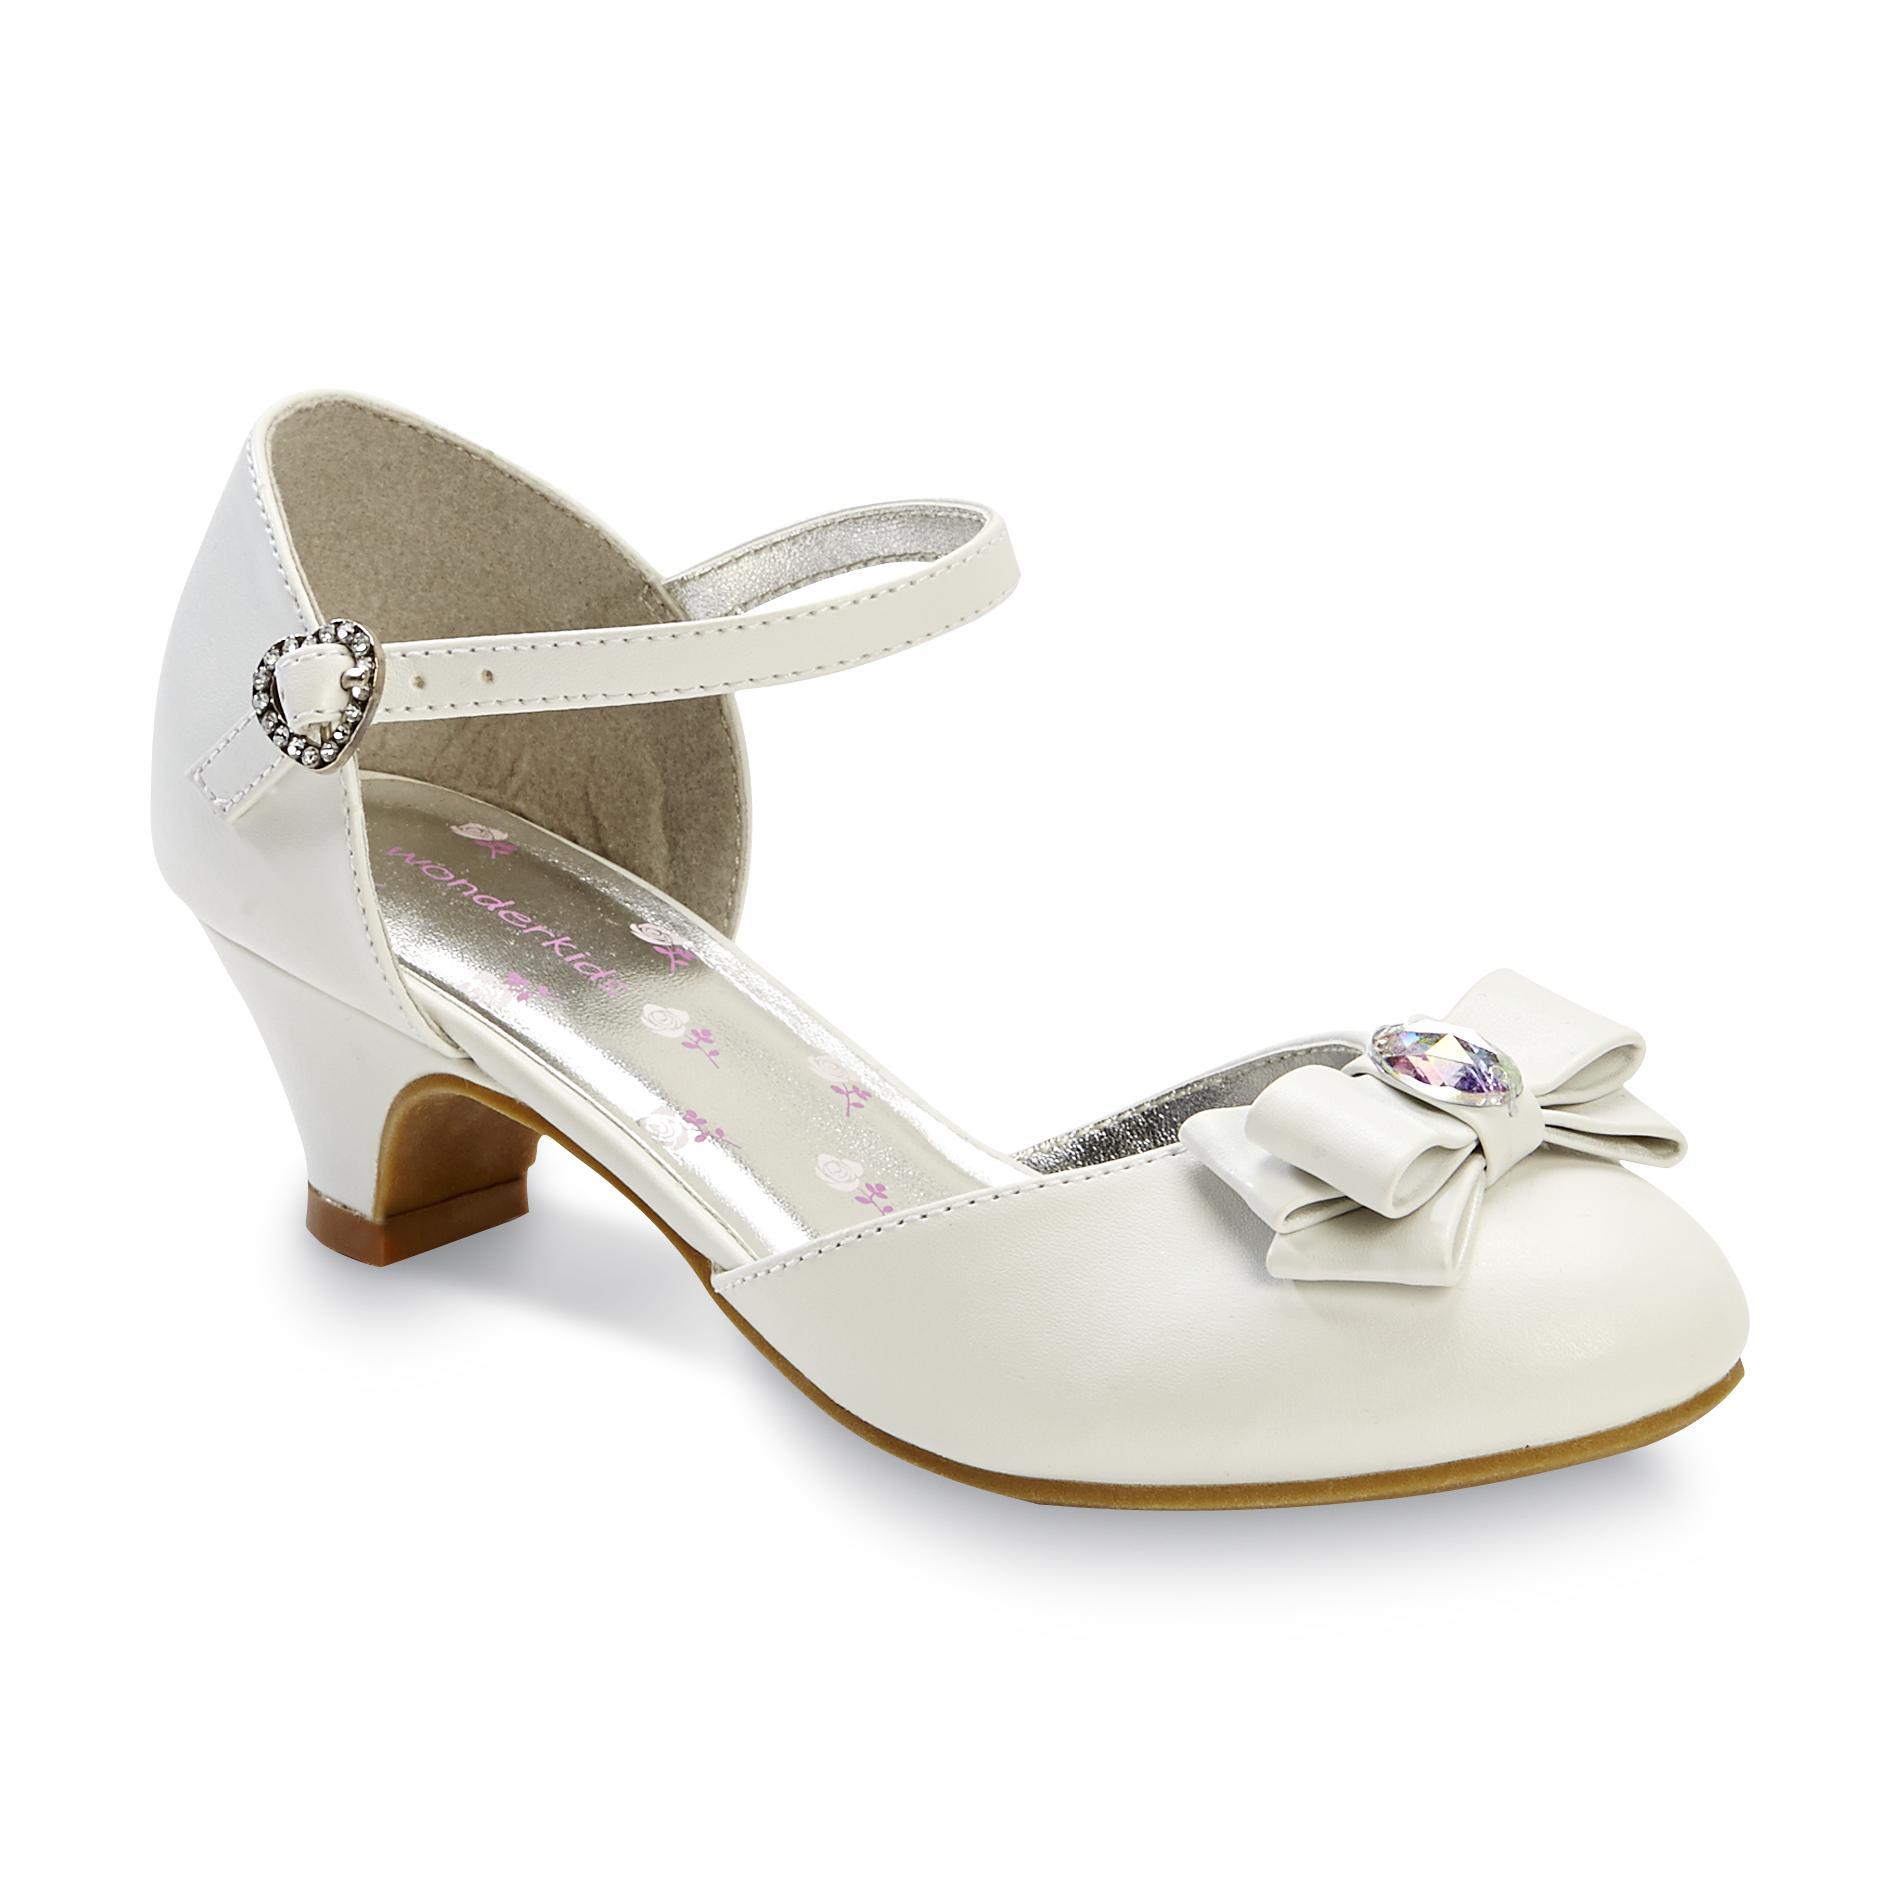 Sears Girls White Dress Shoes